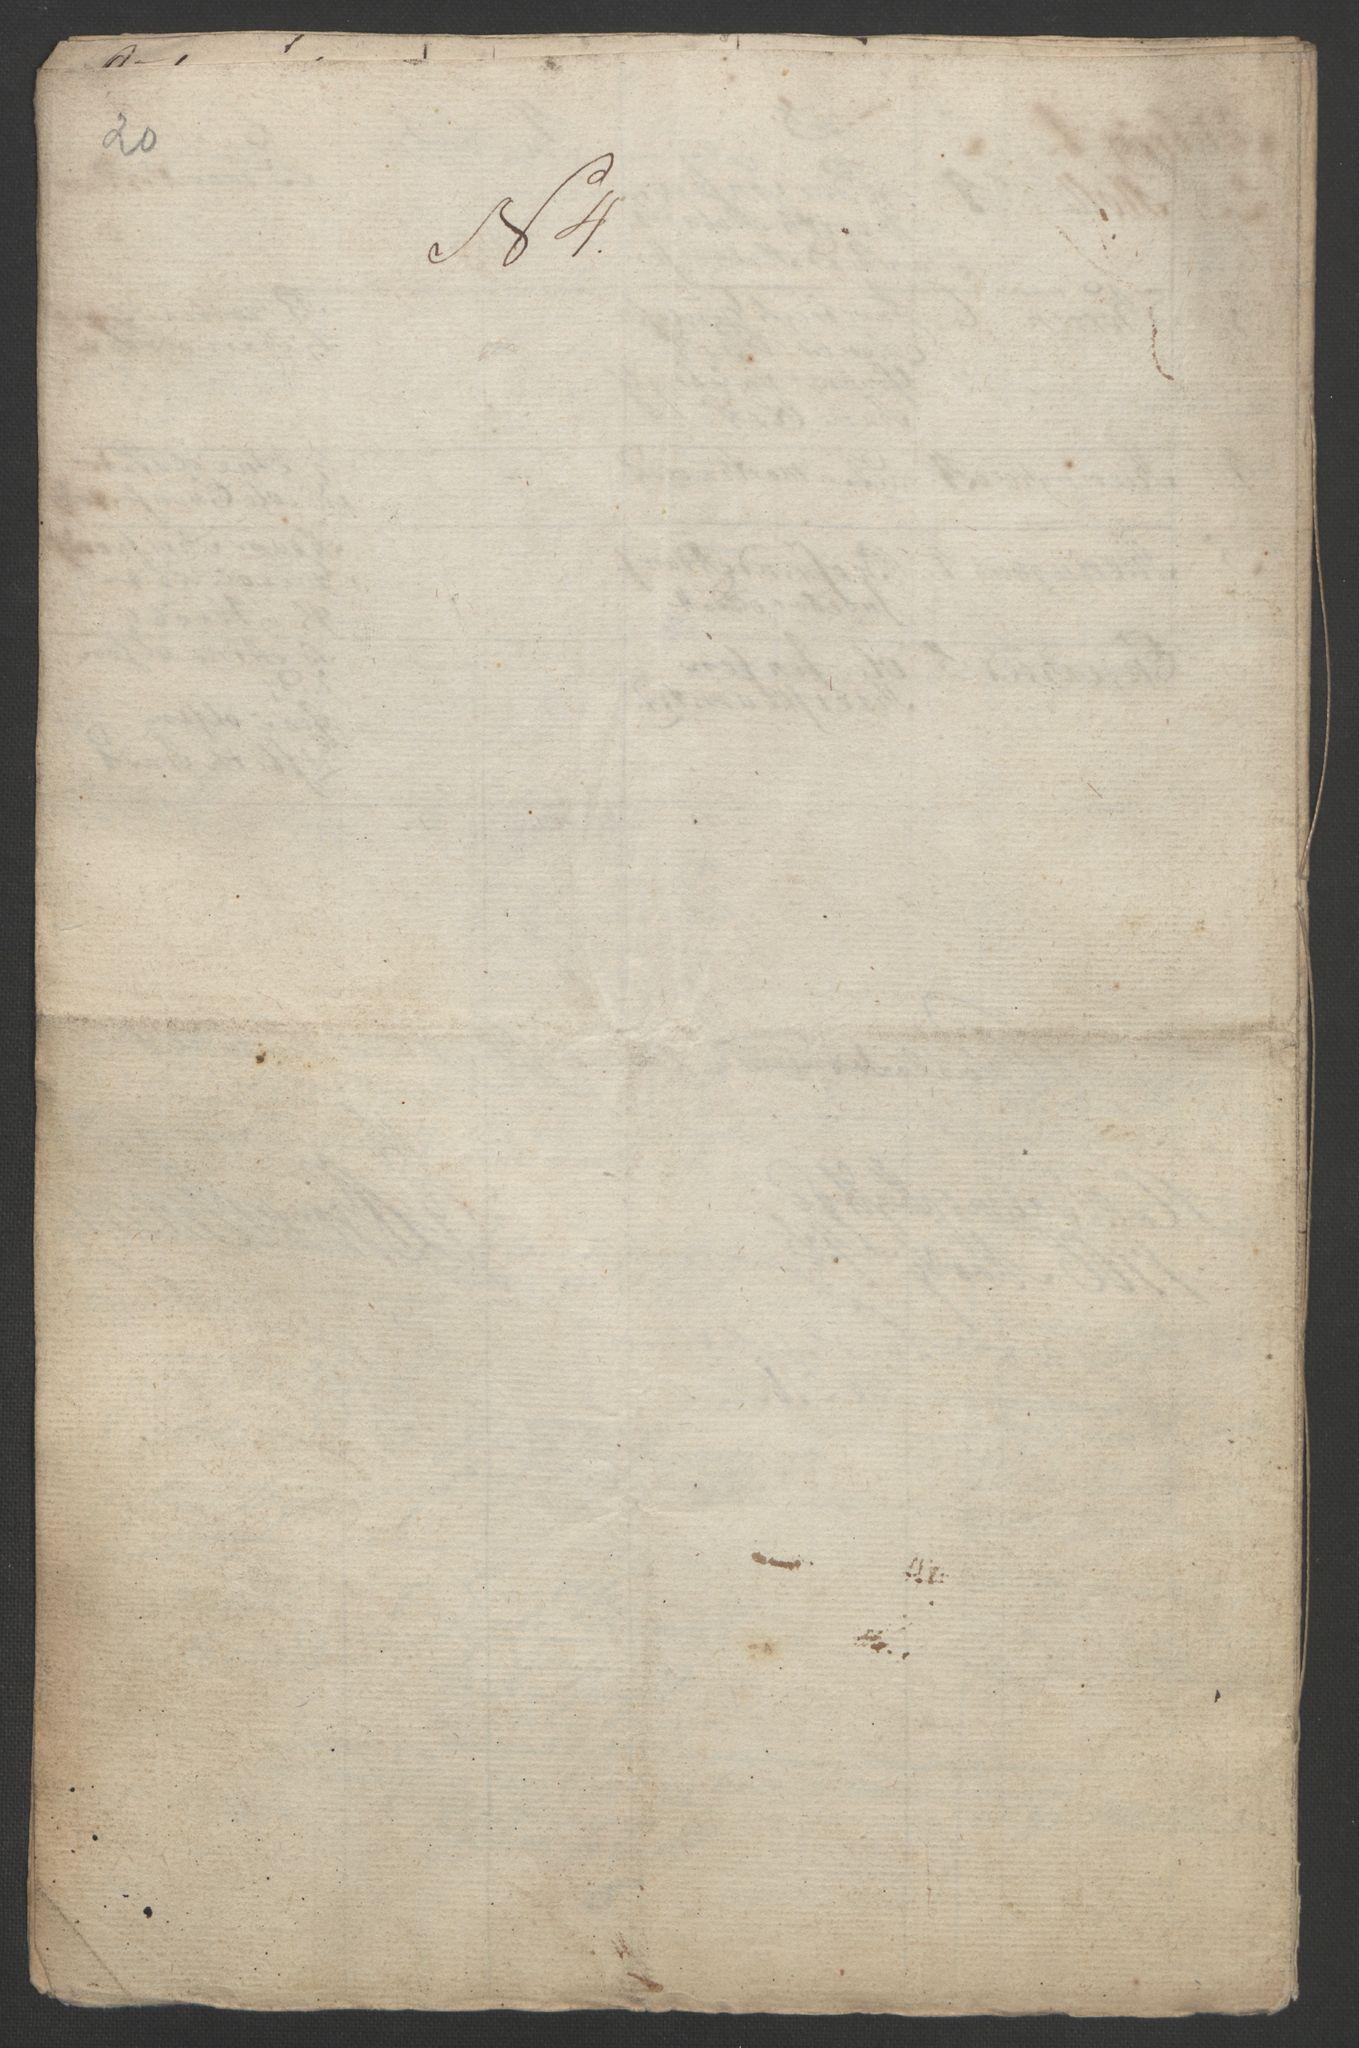 RA, Rentekammeret inntil 1814, Realistisk ordnet avdeling, Ol/L0021: [Gg 10]: Ekstraskatten, 23.09.1762. Orkdal og Gauldal, 1762-1767, s. 559